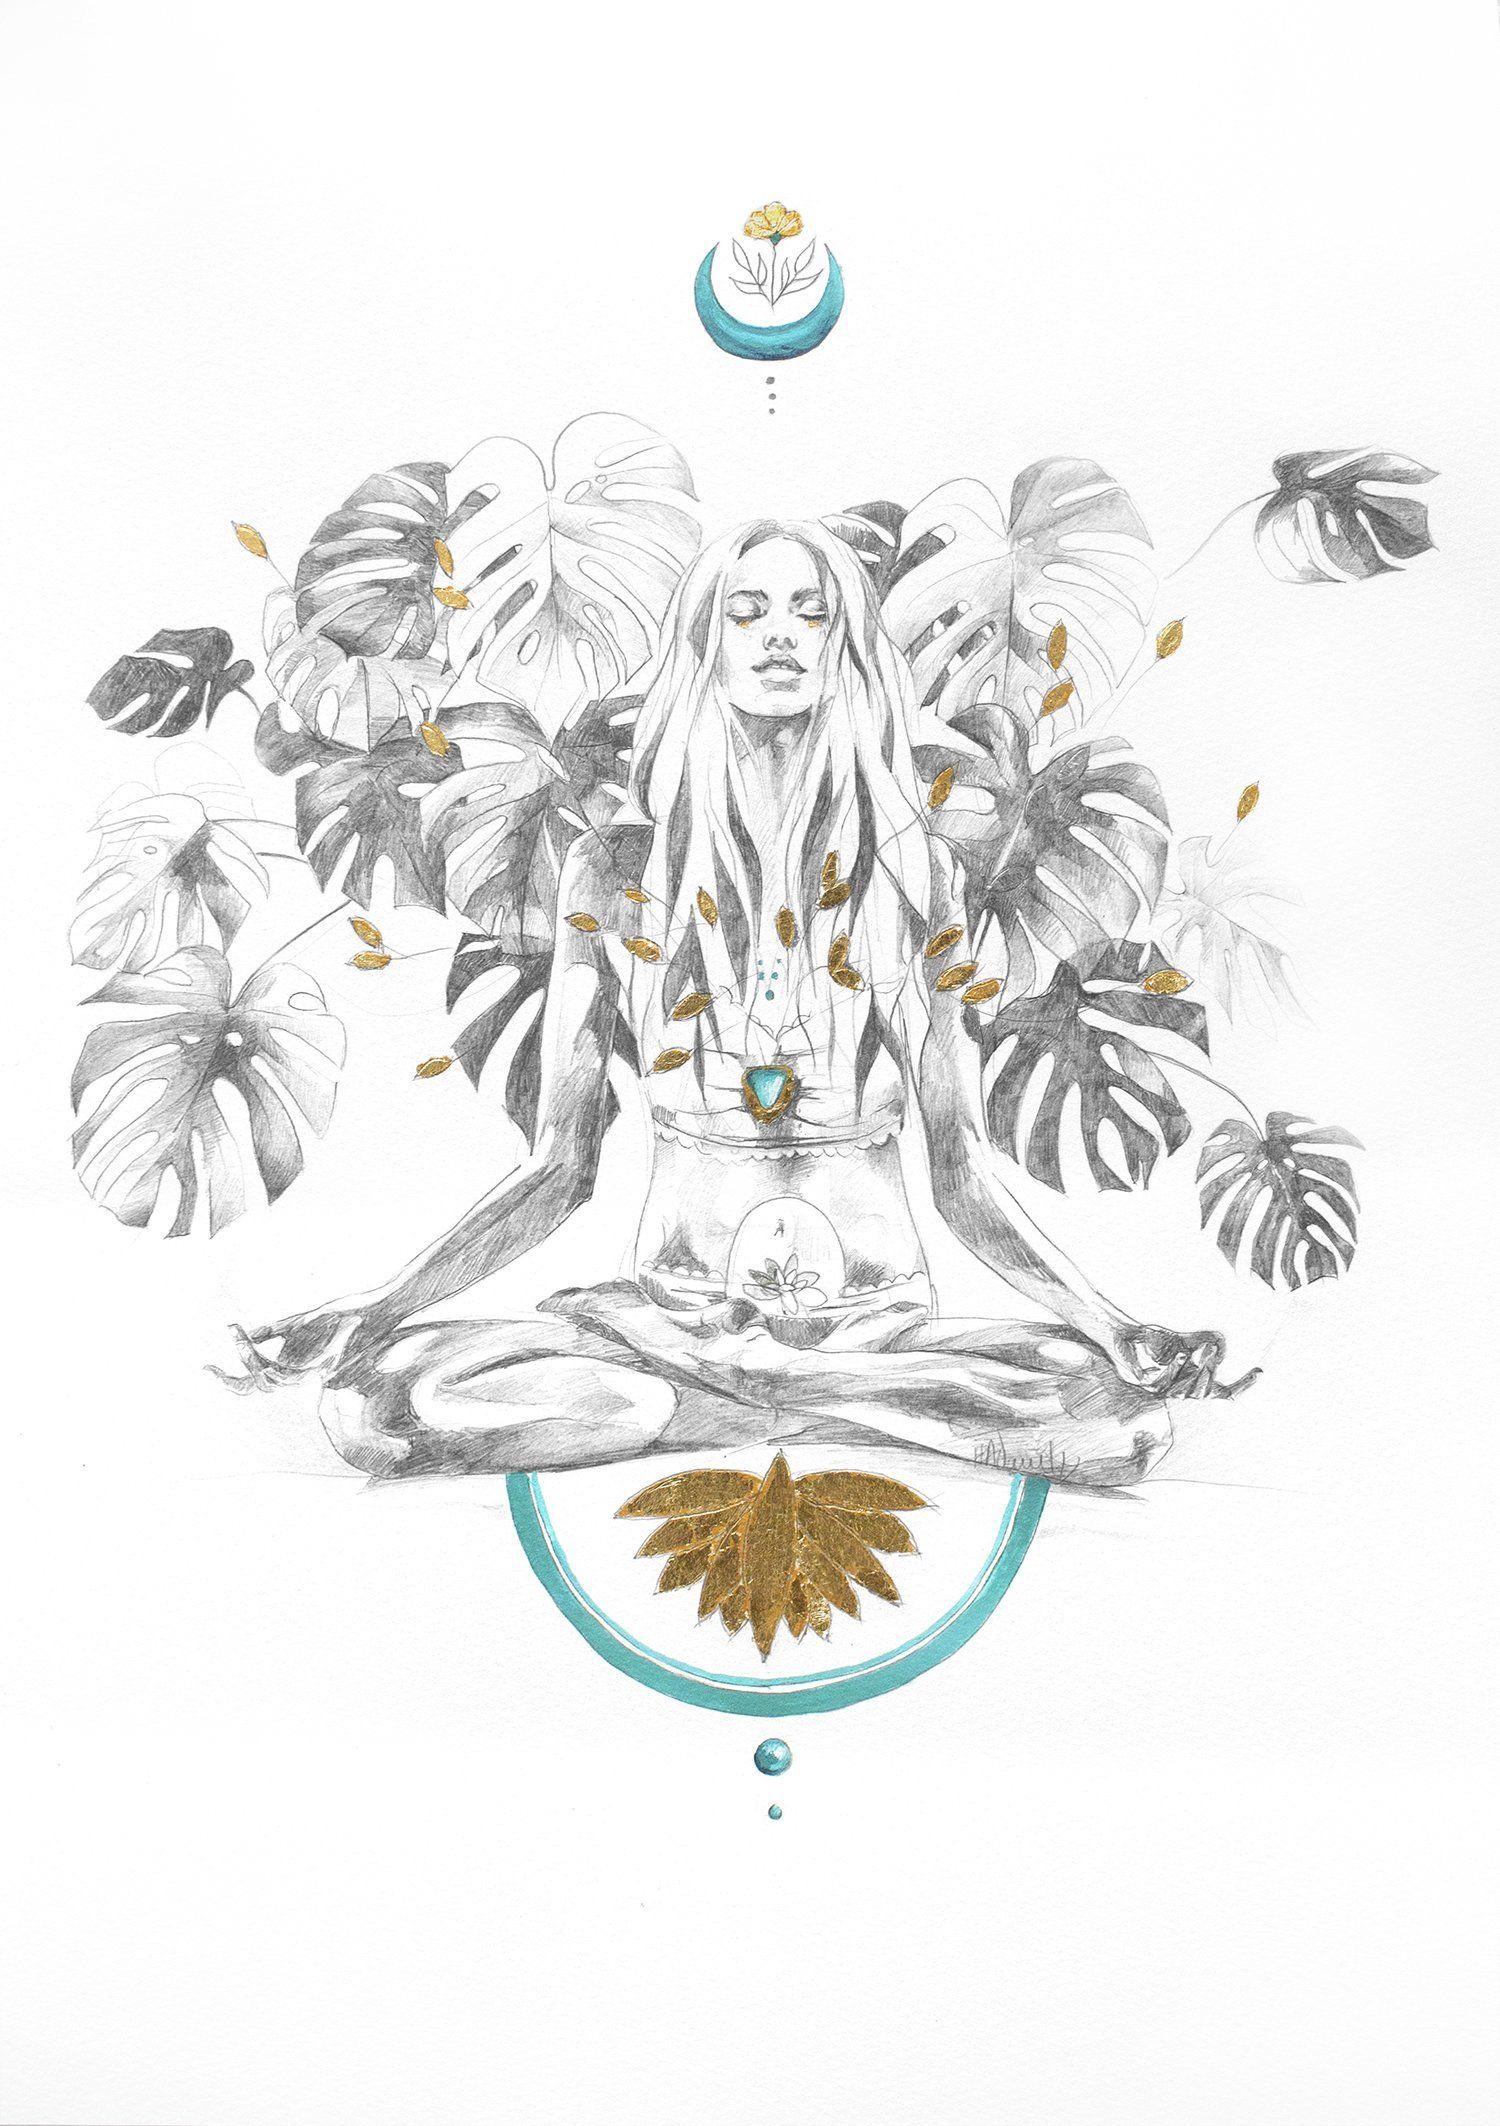 Kleurplaten Mediteren Pin Via Dromenvangers Winkeltje Patroon Tekening Prent Sjabloon Tropic Sunshine Van Hann Yoga Art Spiritual Art Art Prints Online